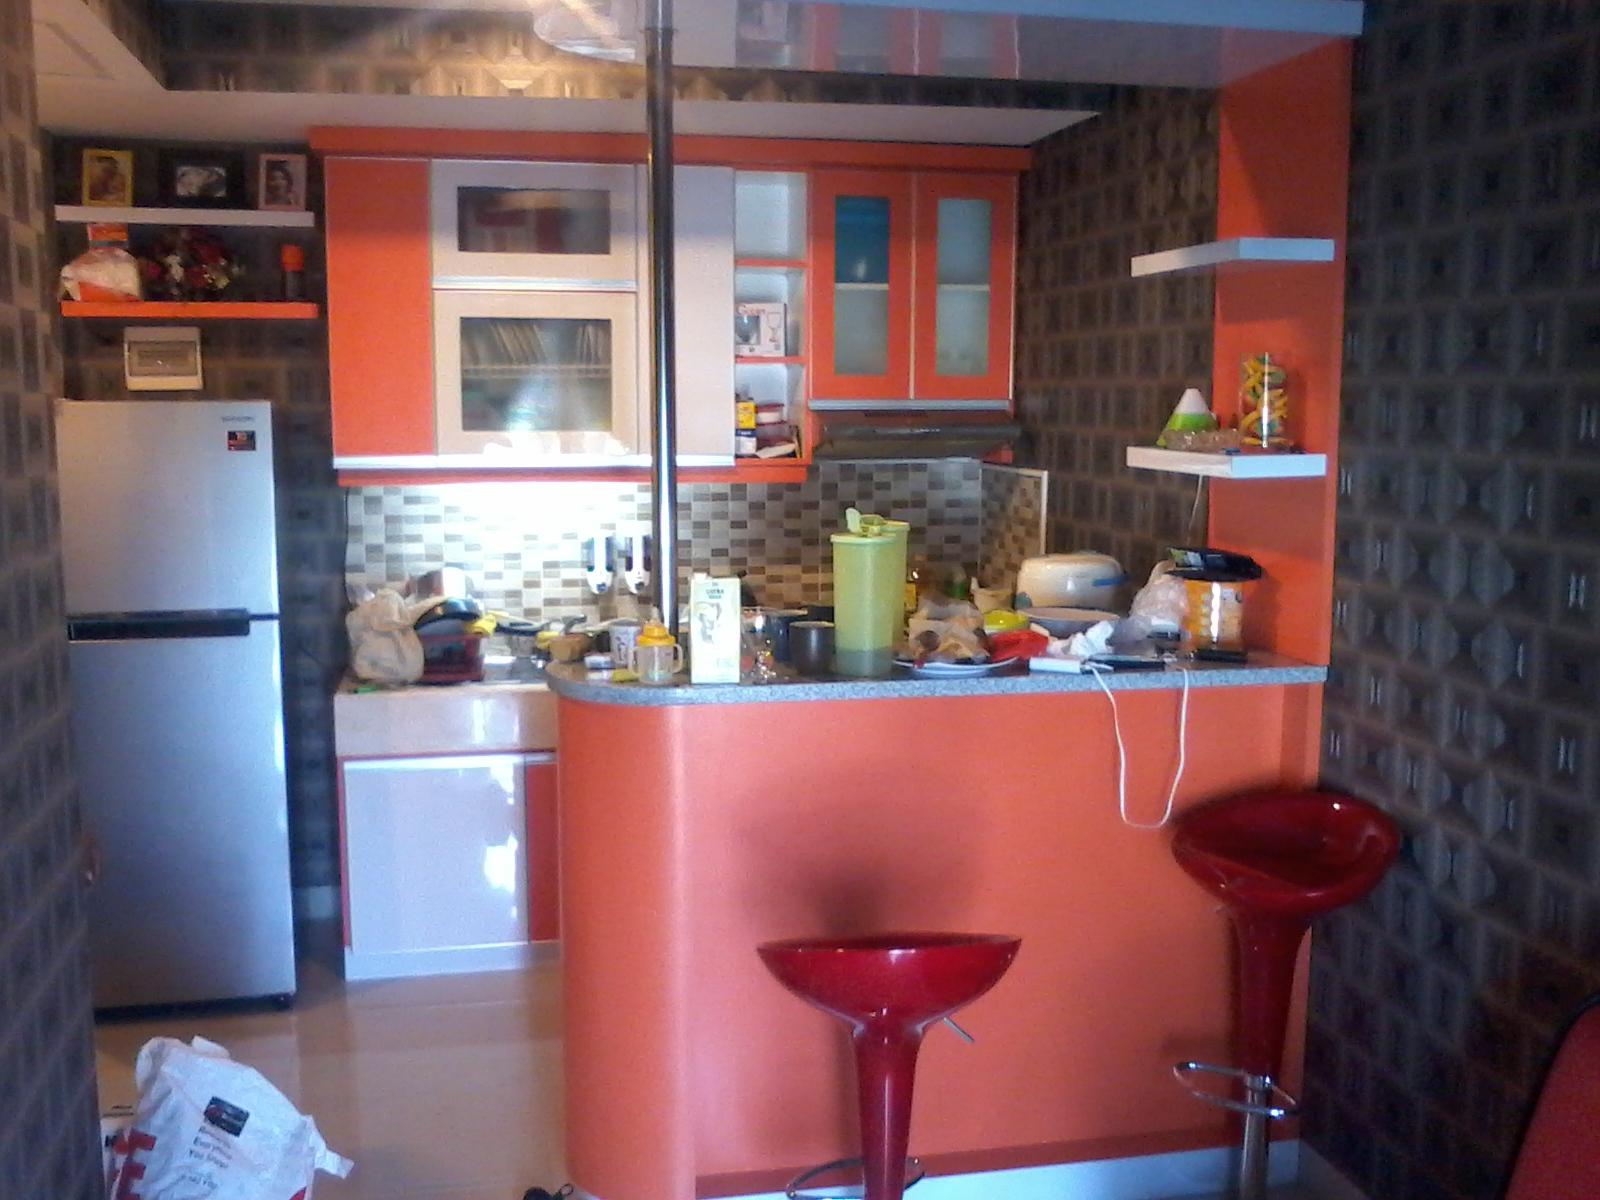 100 Buat Kitchen Set Murah Jasa Kitchen Set Depok Hub 0812